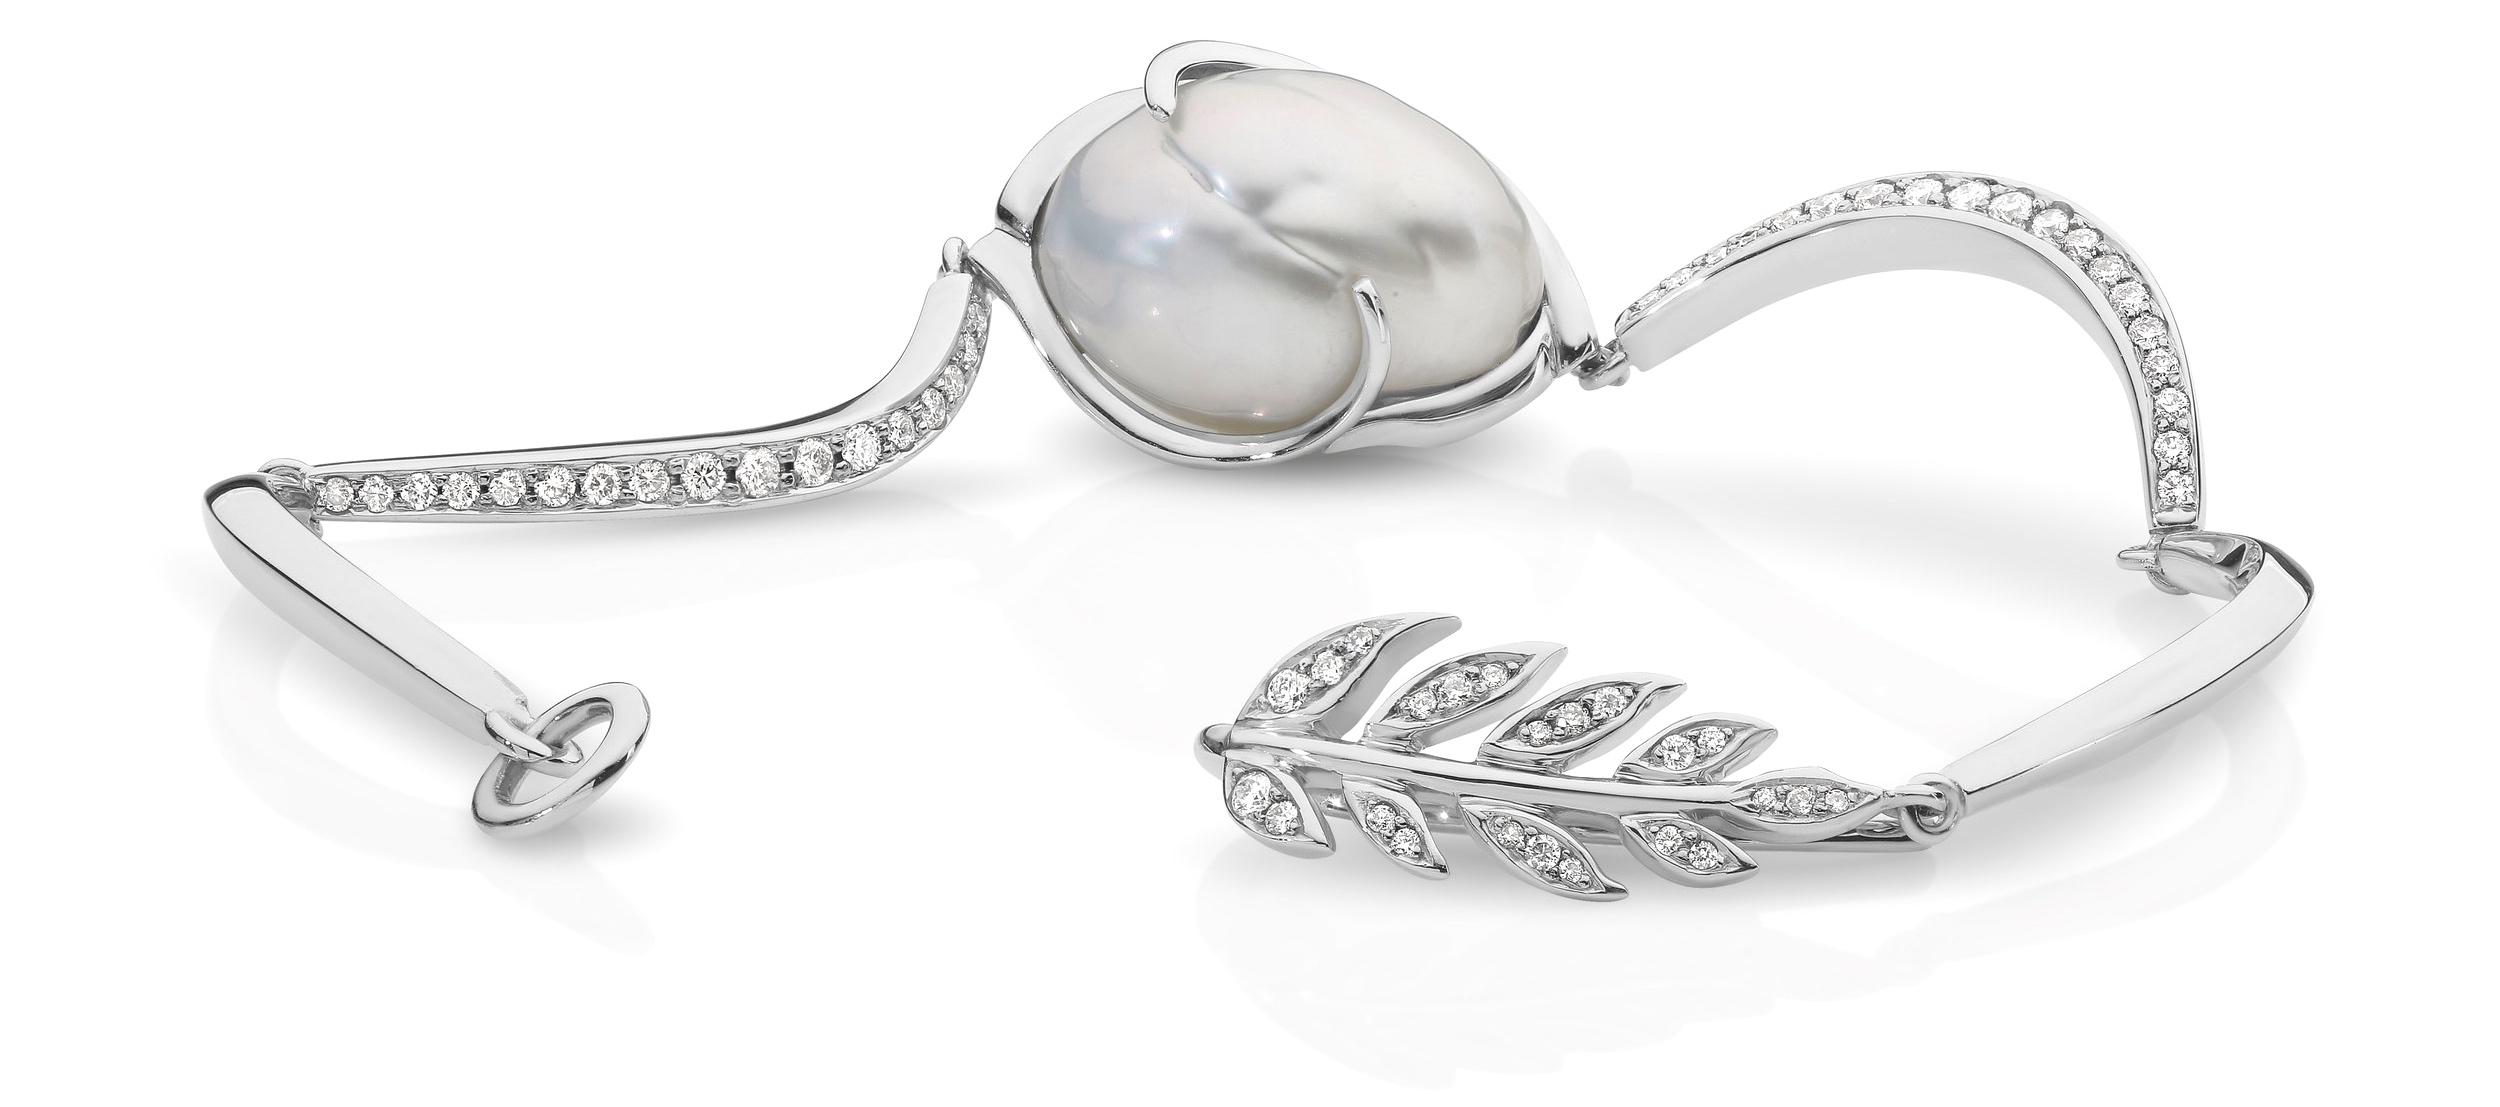 Fine+Jewellery+Images+Jewellery+Photography+Masterclass.jpg